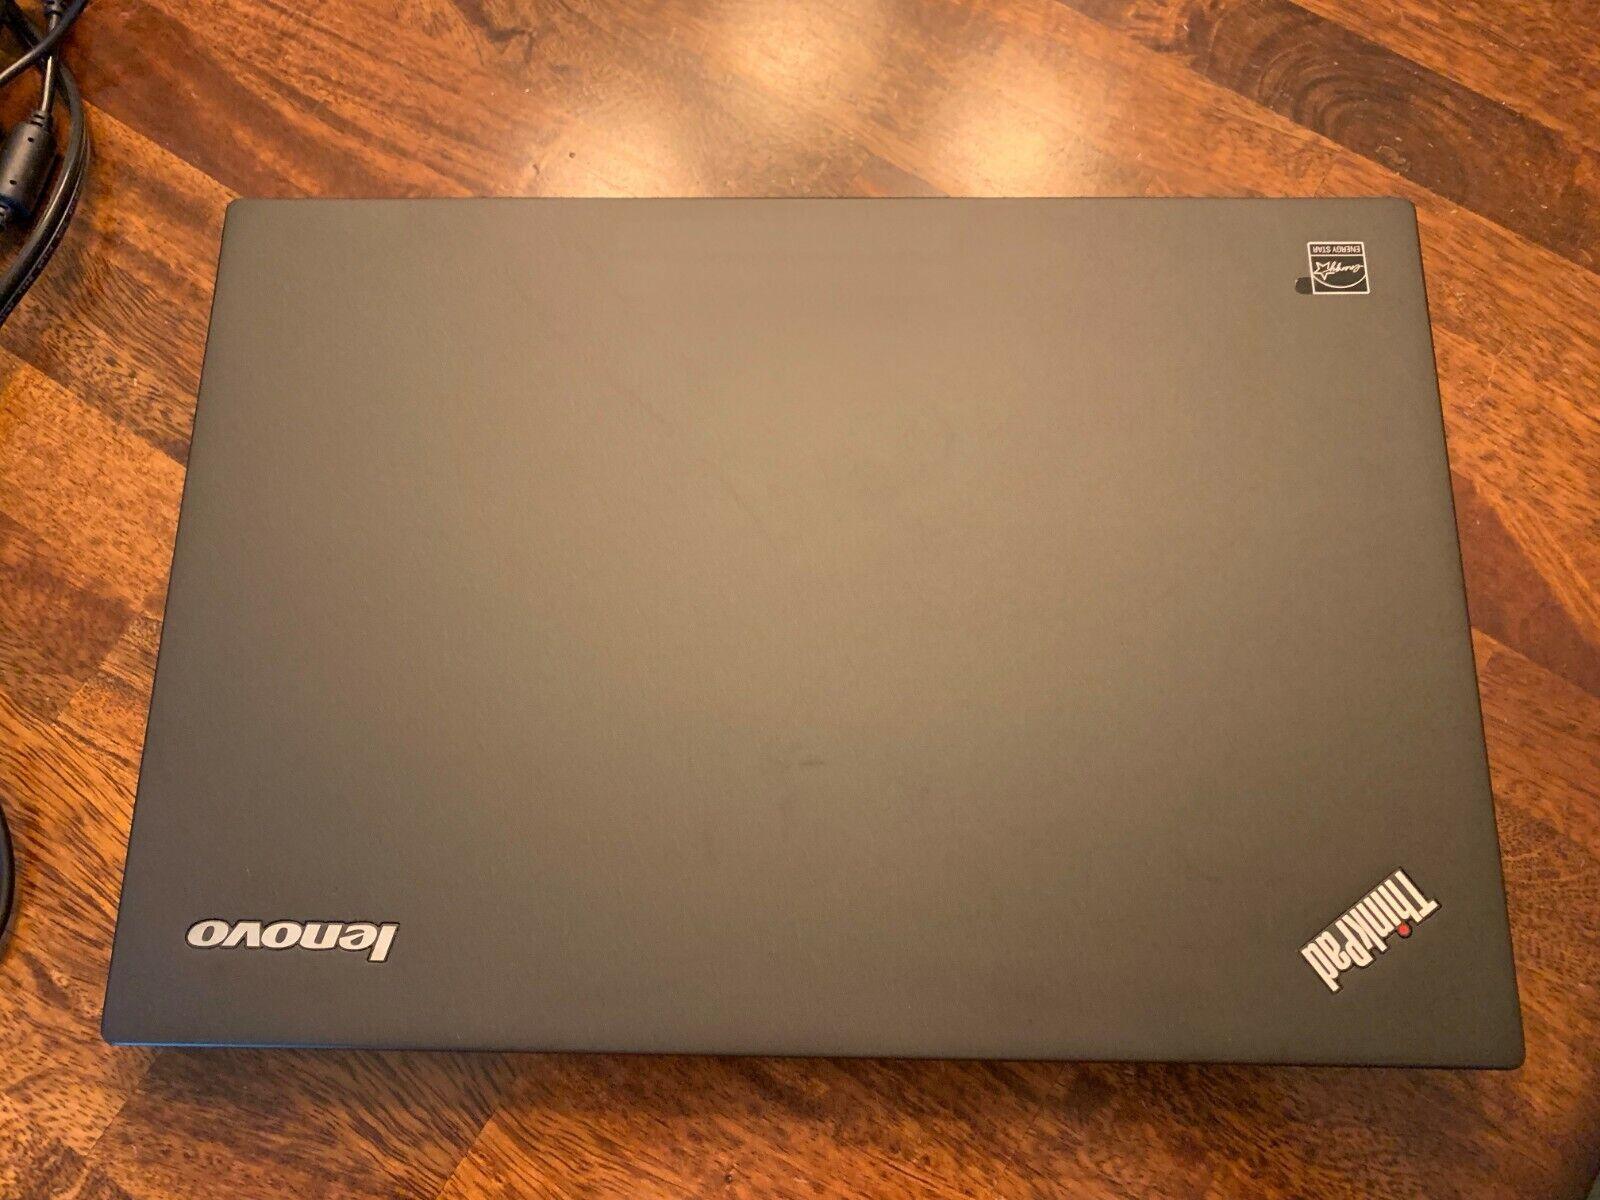 Laptop Windows - Lenovo ThinkPad T450s i5 8GB 128GB SSD Windows10 Pro BackLit Keyboard